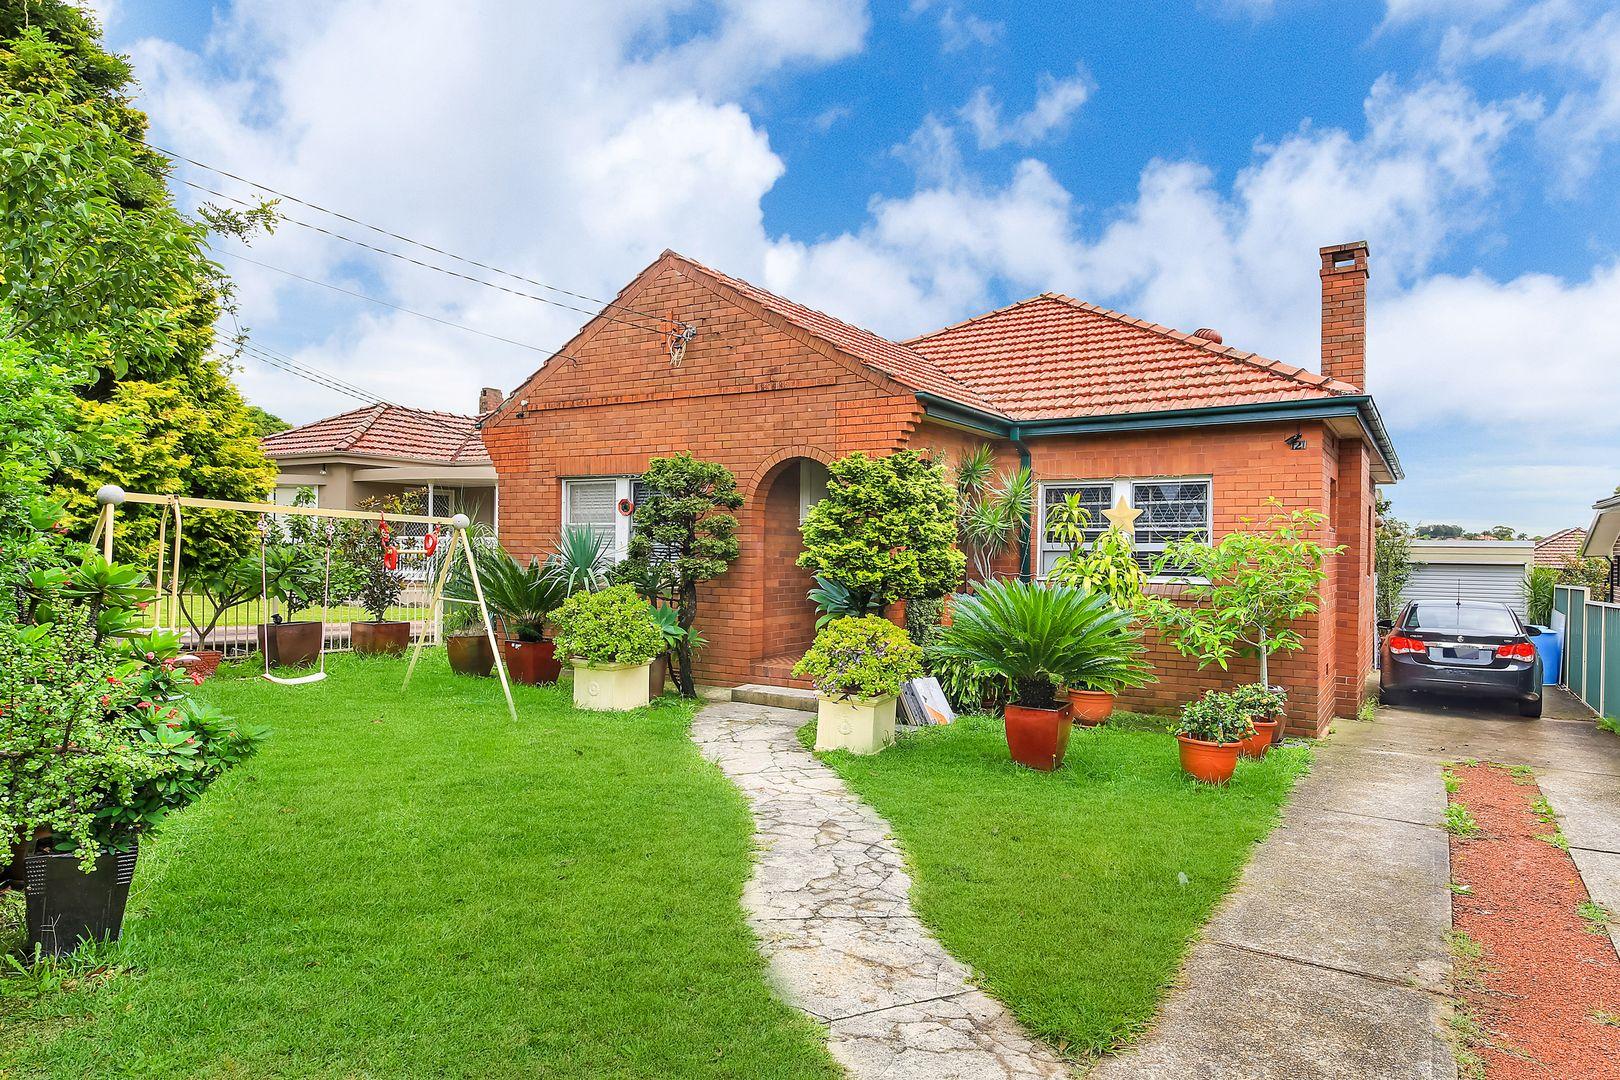 121 BARDWELL RD, Bardwell Park NSW 2207, Image 0